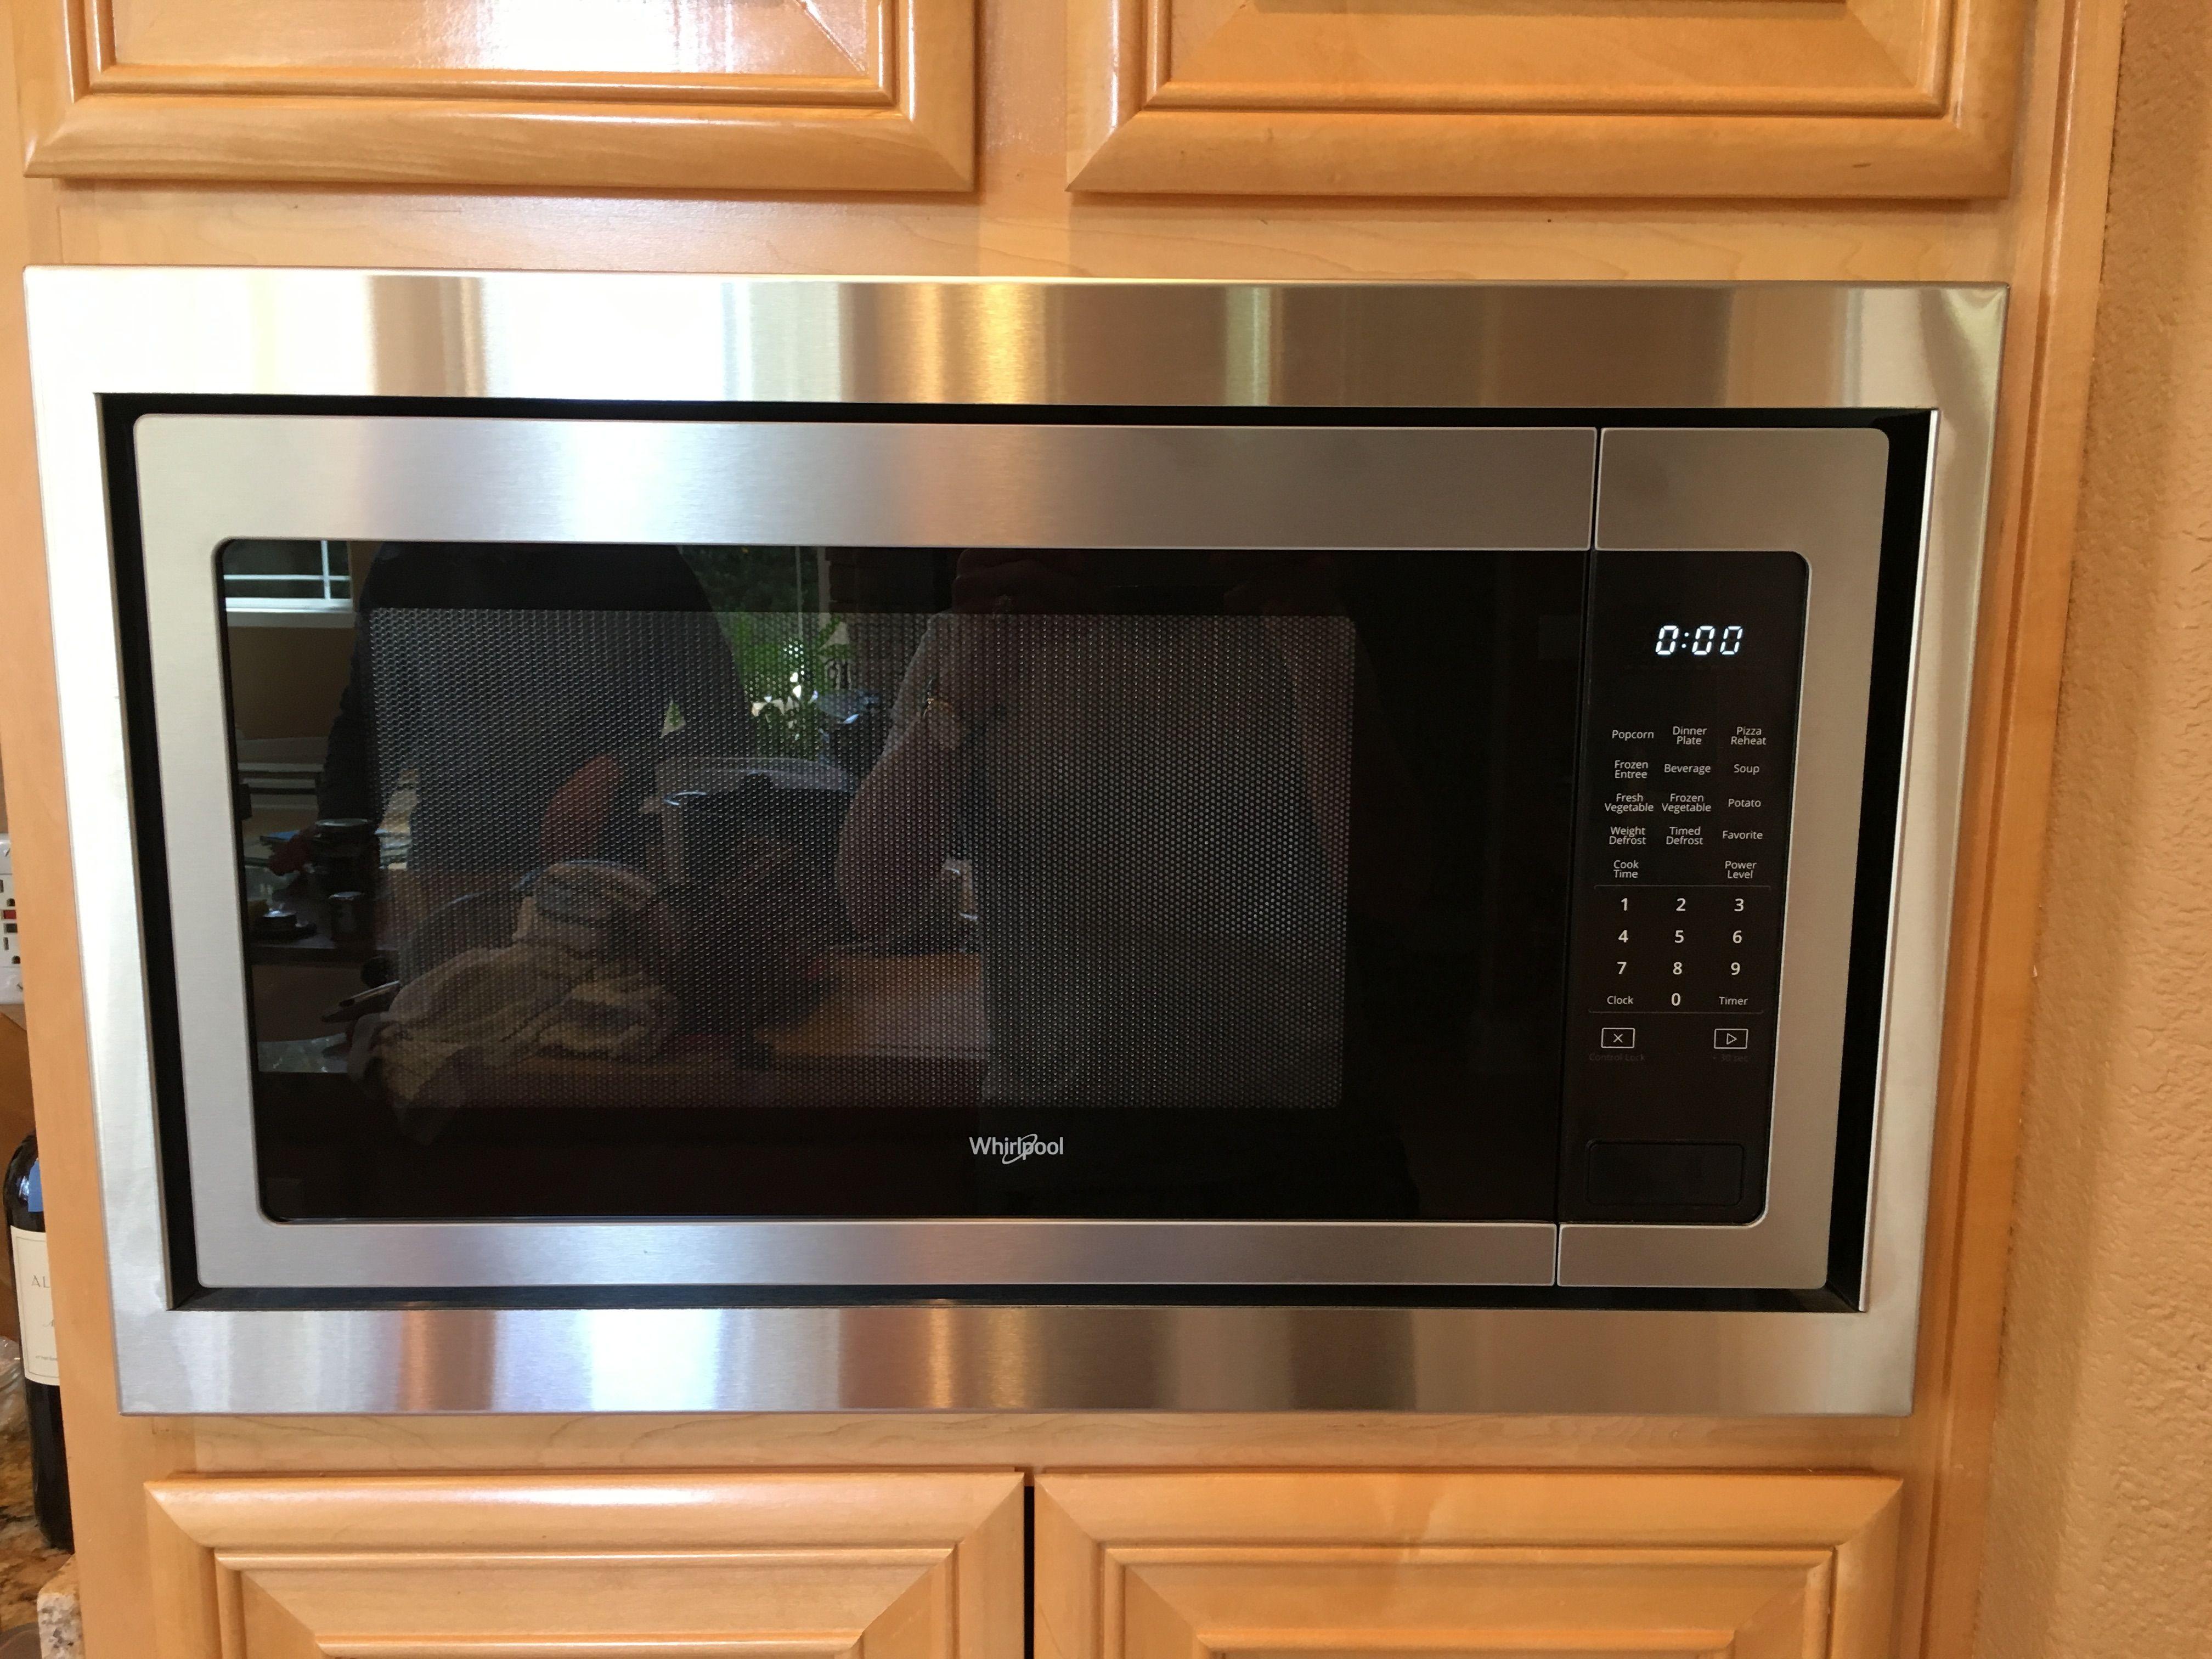 microwave trim kit microwave oven